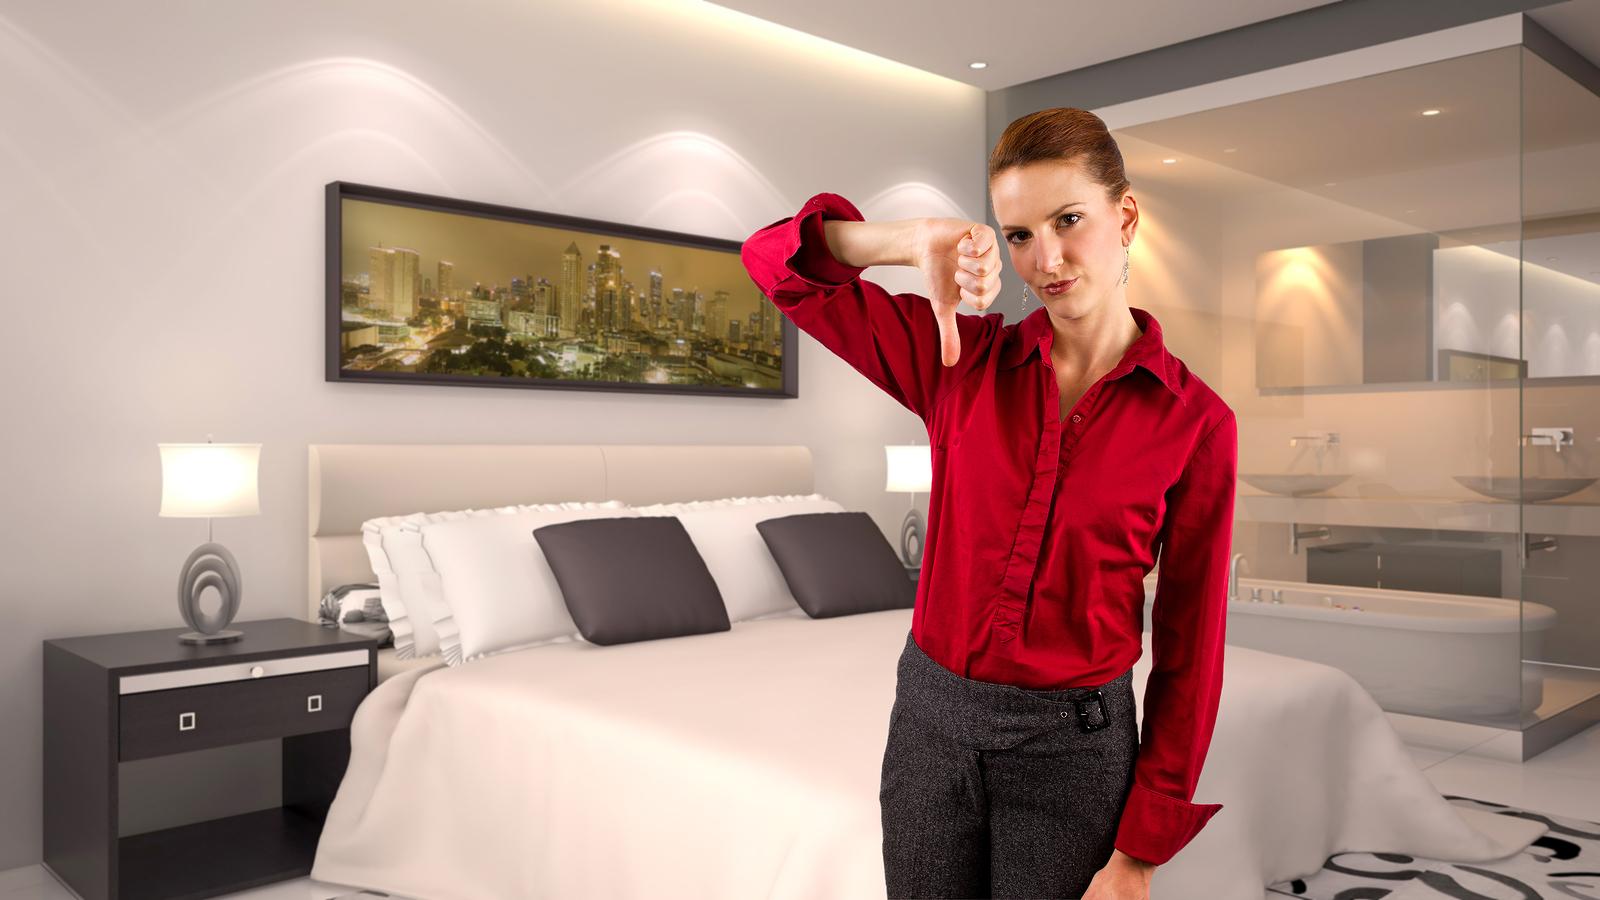 bigstock-businesswoman-in-a-hotelroom-59647070.jpg